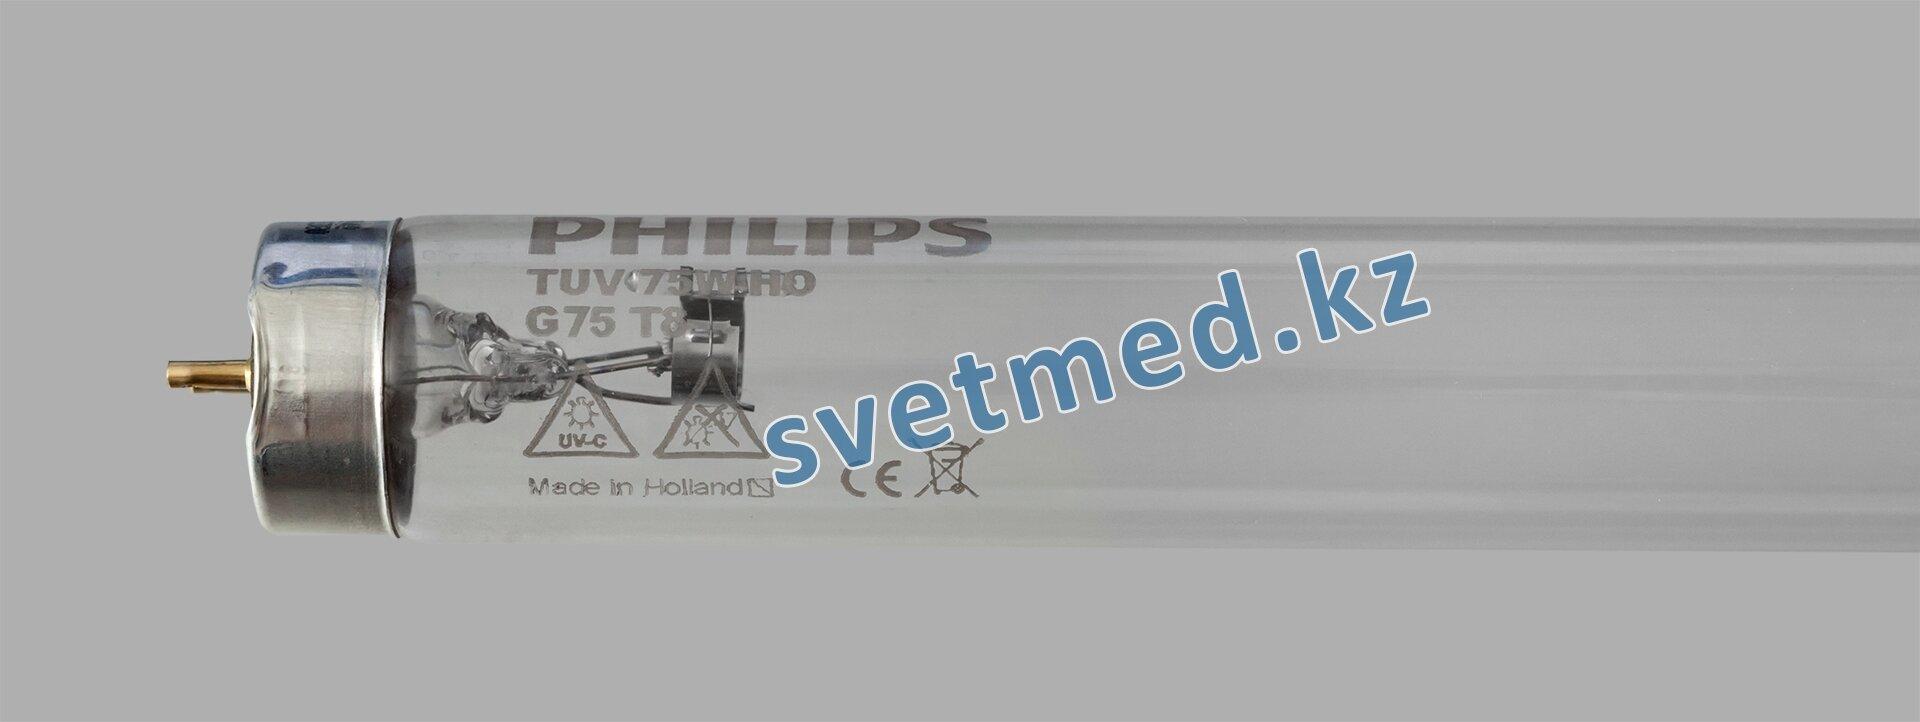 Лампа бактерицидная Philips TUV 75W HO G13 - фото pic_cab5546fb51c36d0c8925083a55162ee_1920x9000_1.jpg